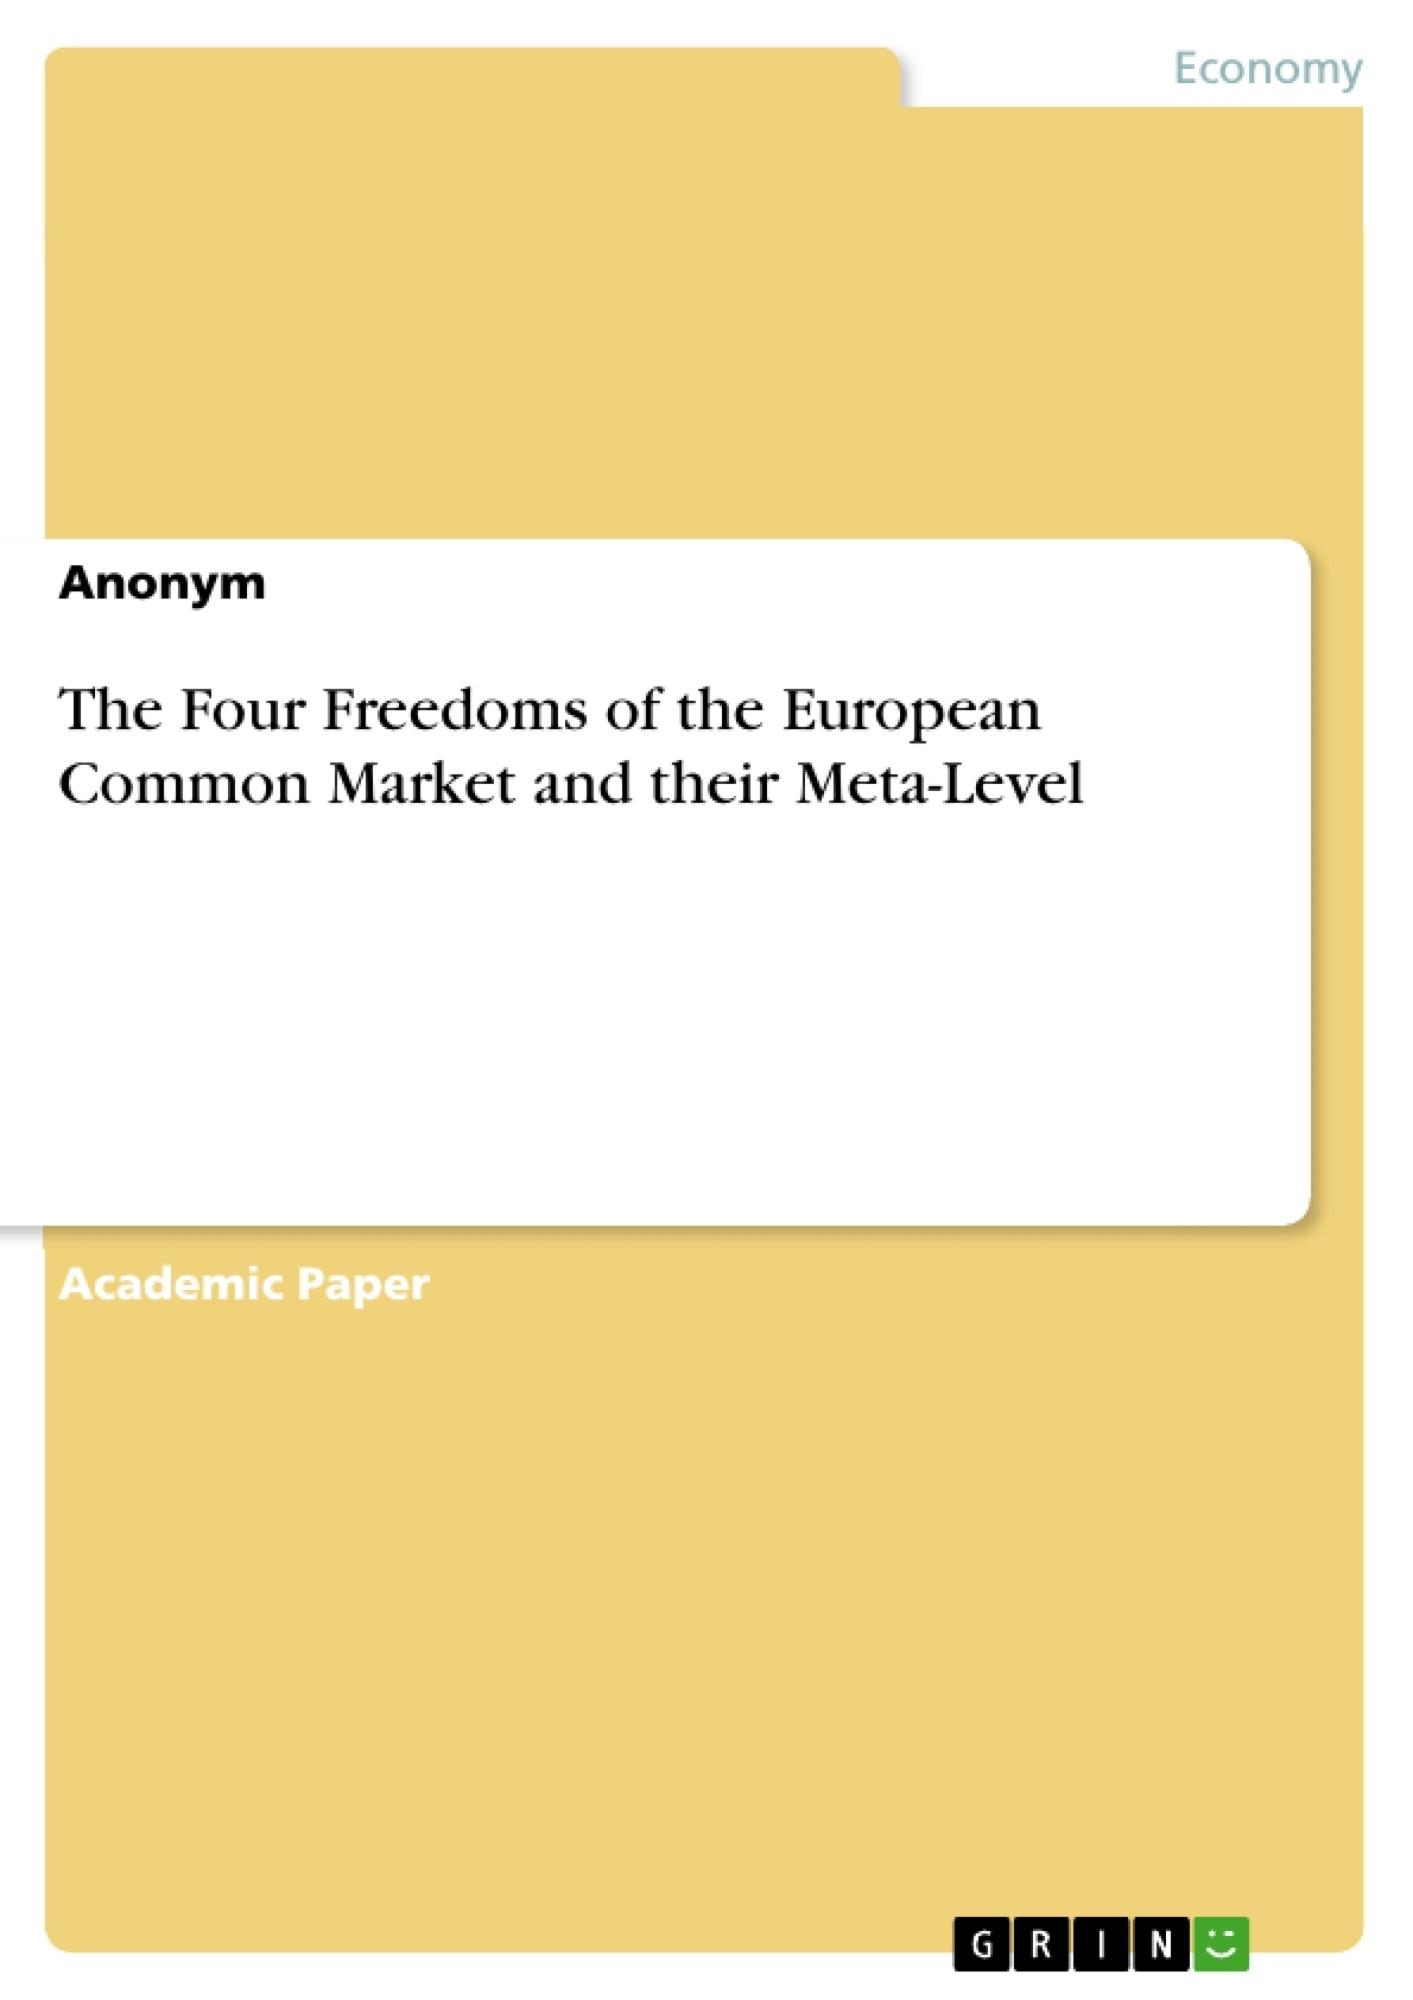 Title: The Four Freedoms of the European Common Market and their Meta-Level